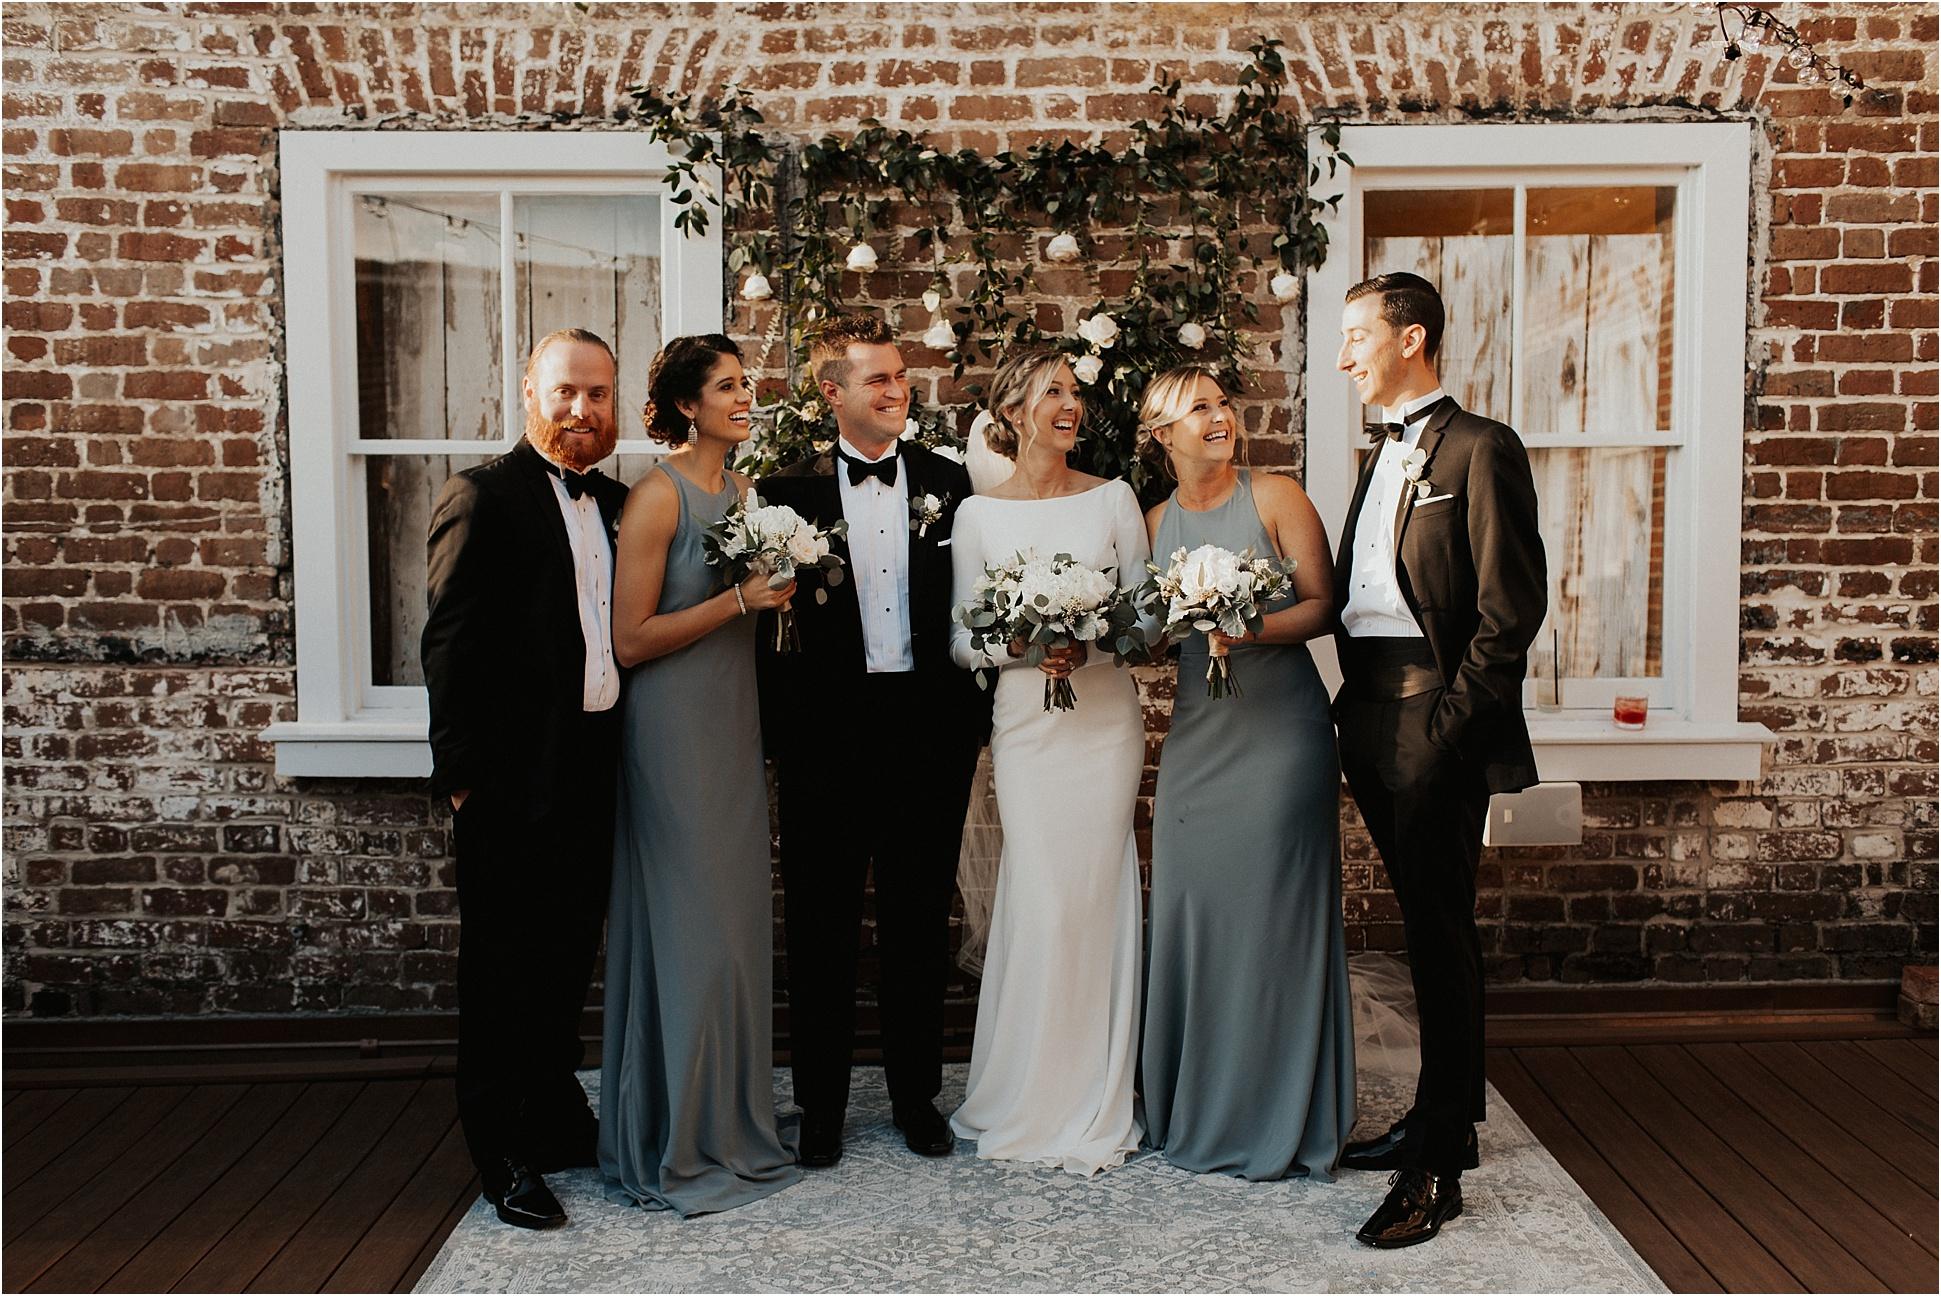 upstairs_midtown_intimate_charleston_wedding050.JPG